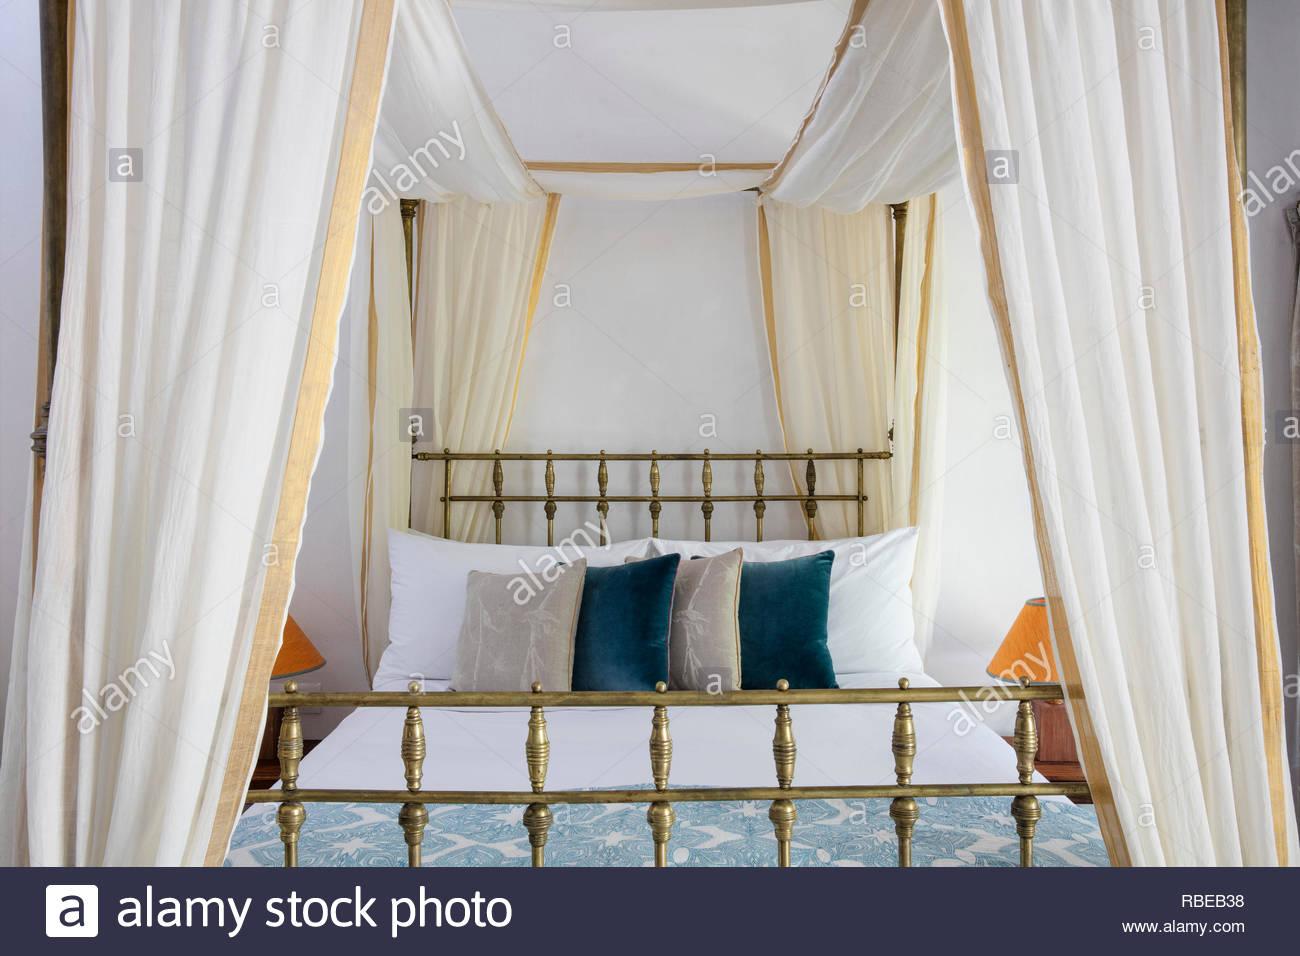 Romantico Letto A Baldacchino.Romantico Letto A Baldacchino Jalakara Villa Hotel Andaman E Isole